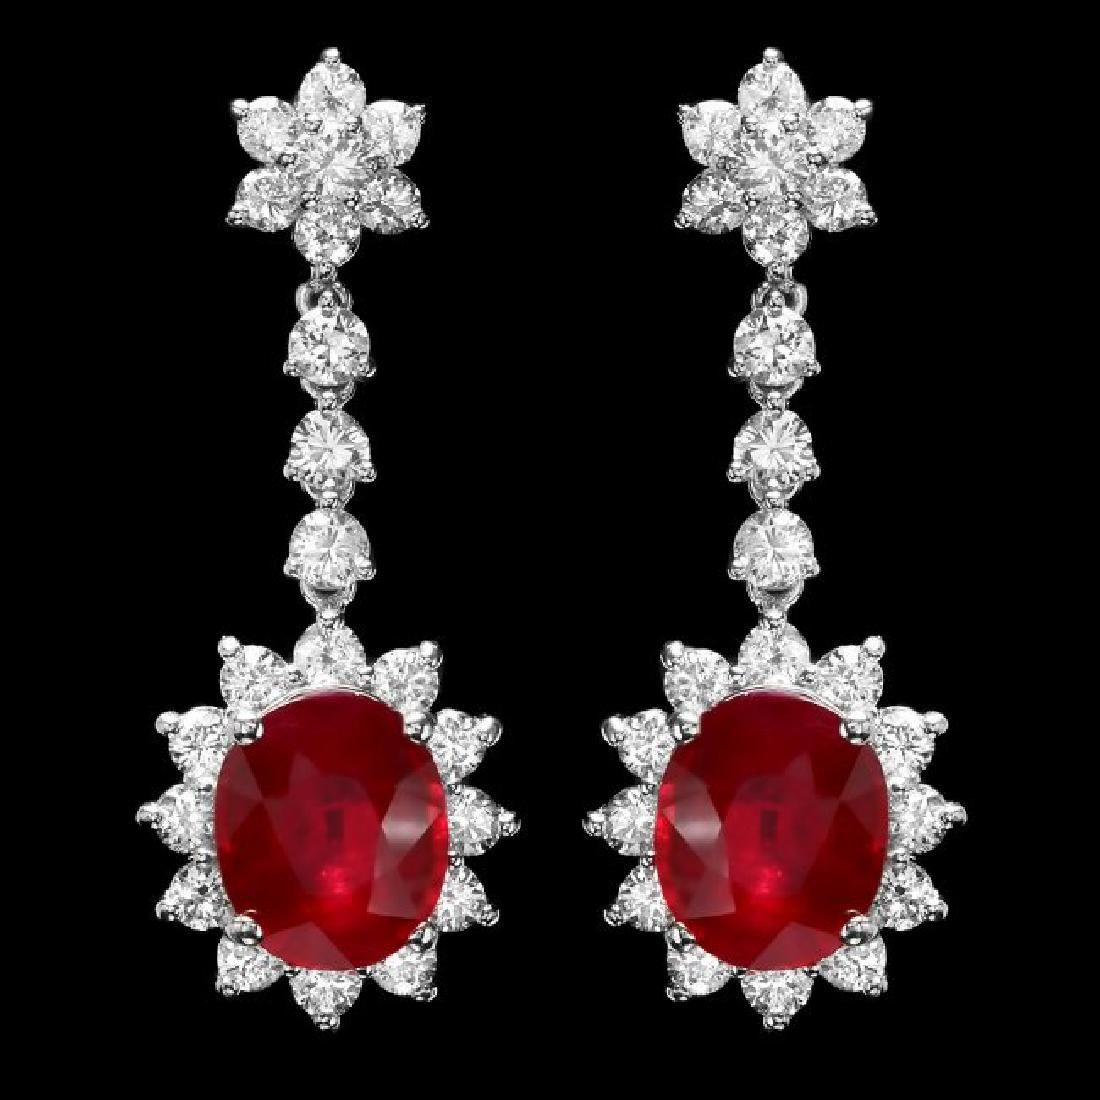 14k Gold 9.00ct Ruby 3.00ct Diamond Earrings - 2